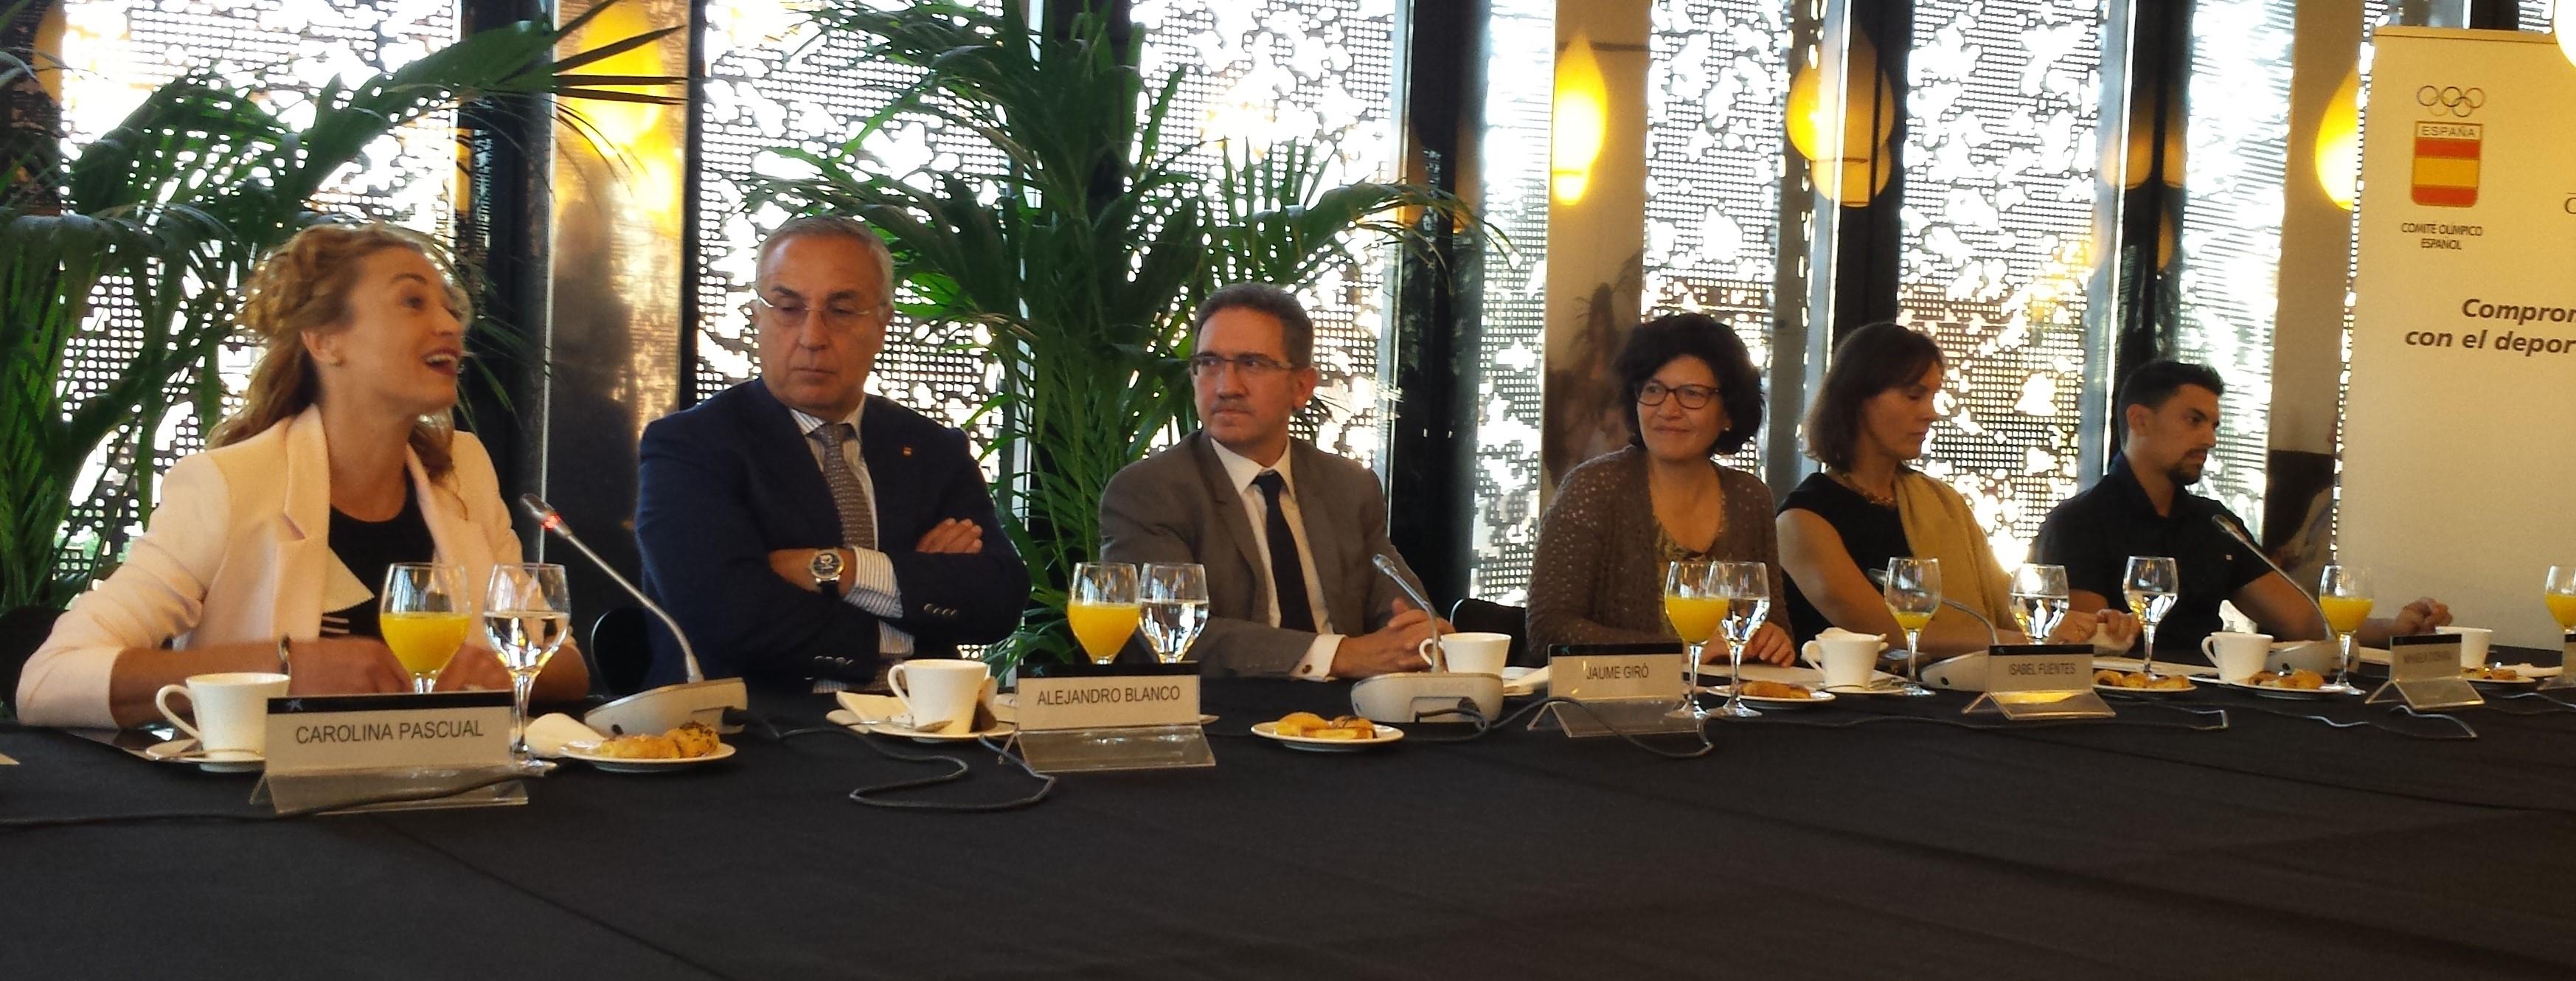 Carolina Pascual, Jaume Giró, Mihaela Ciobanu y Javier Illana. Fuente: Javier García.